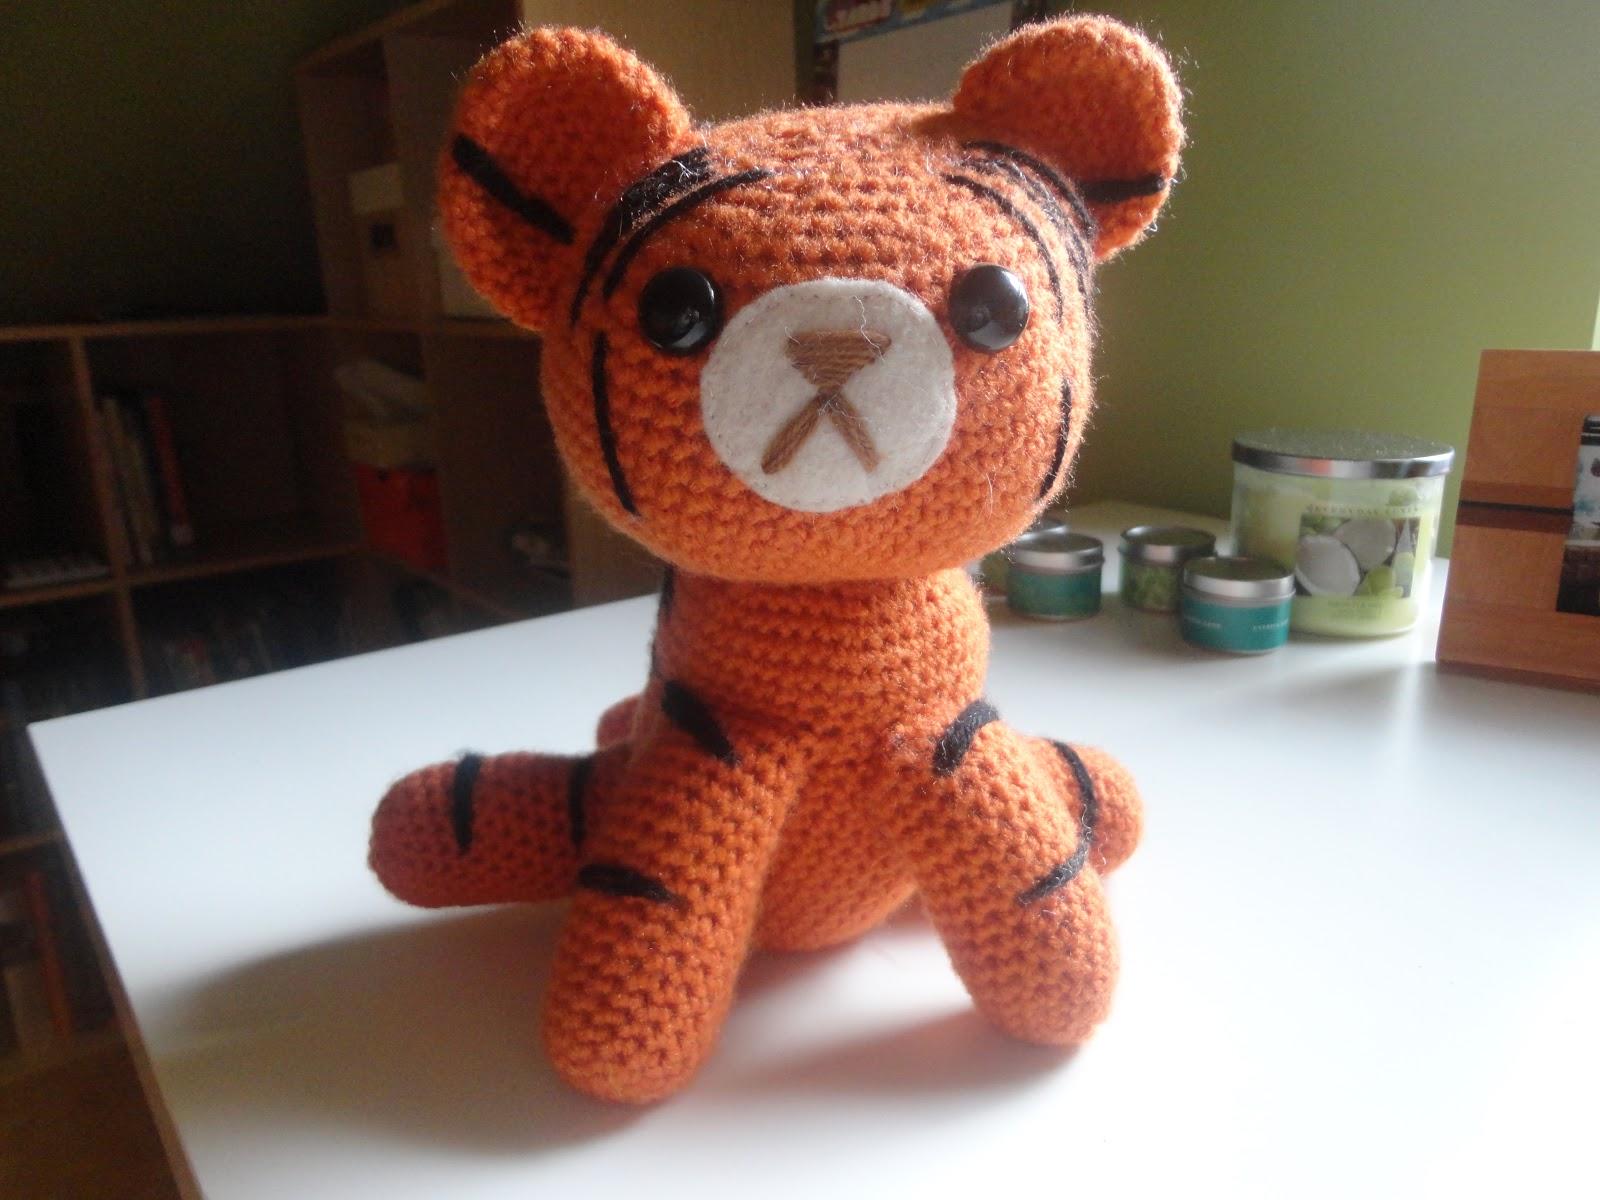 Baby Tiger amigurumi pattern - Amigurumipatterns.net | 1200x1600